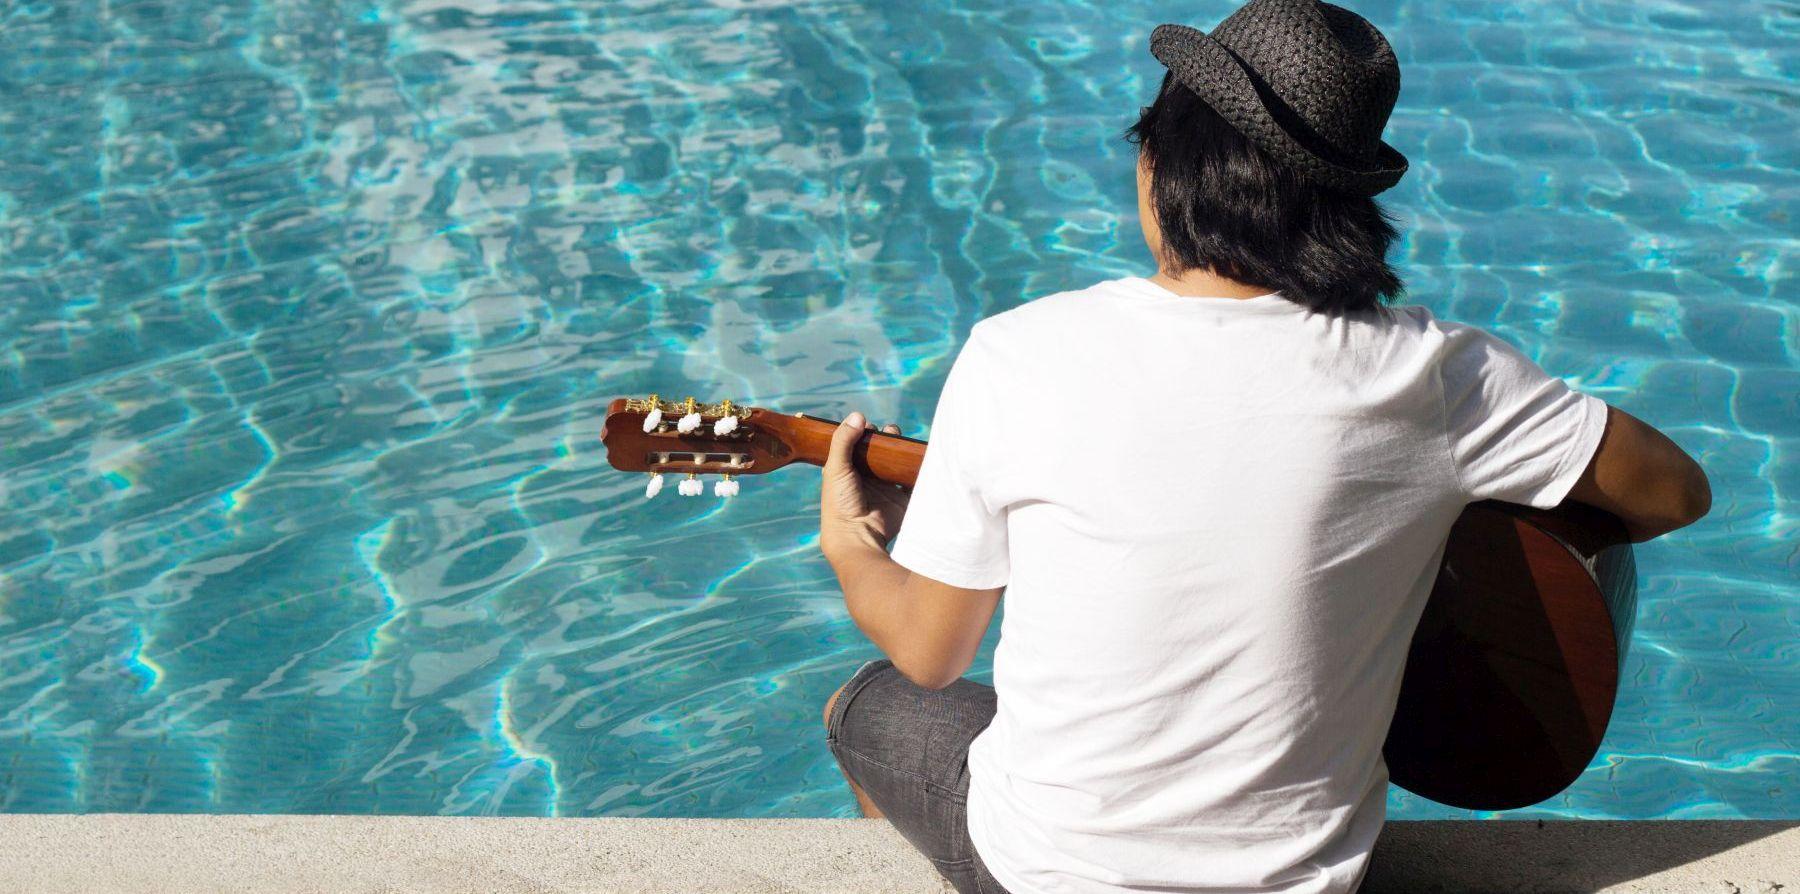 garder-niveau-musique-vacances-1